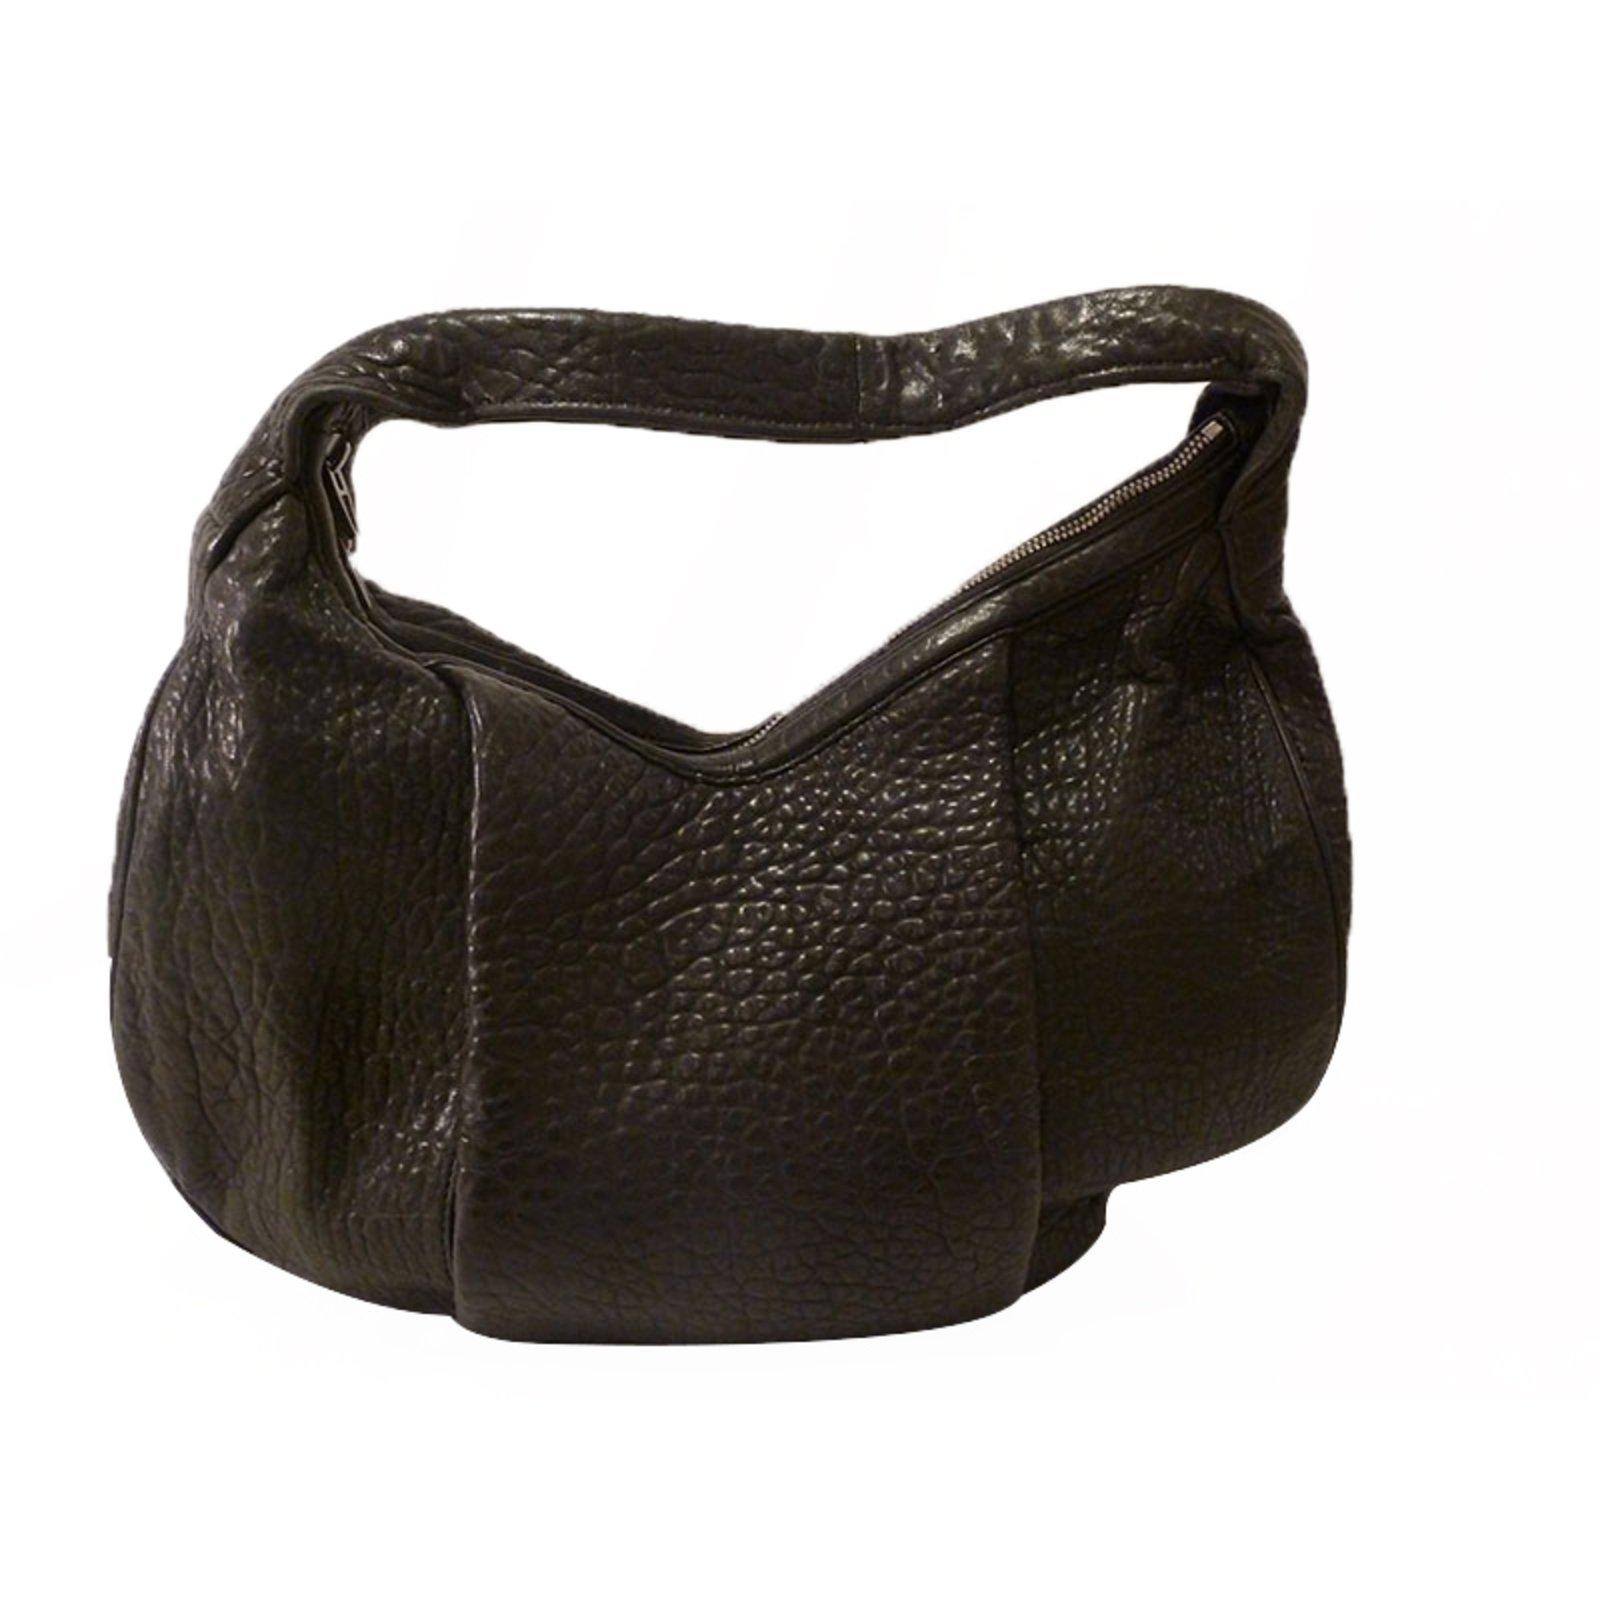 Alexander Morgan Hobo Bag Handbags Leather Black Ref 21607